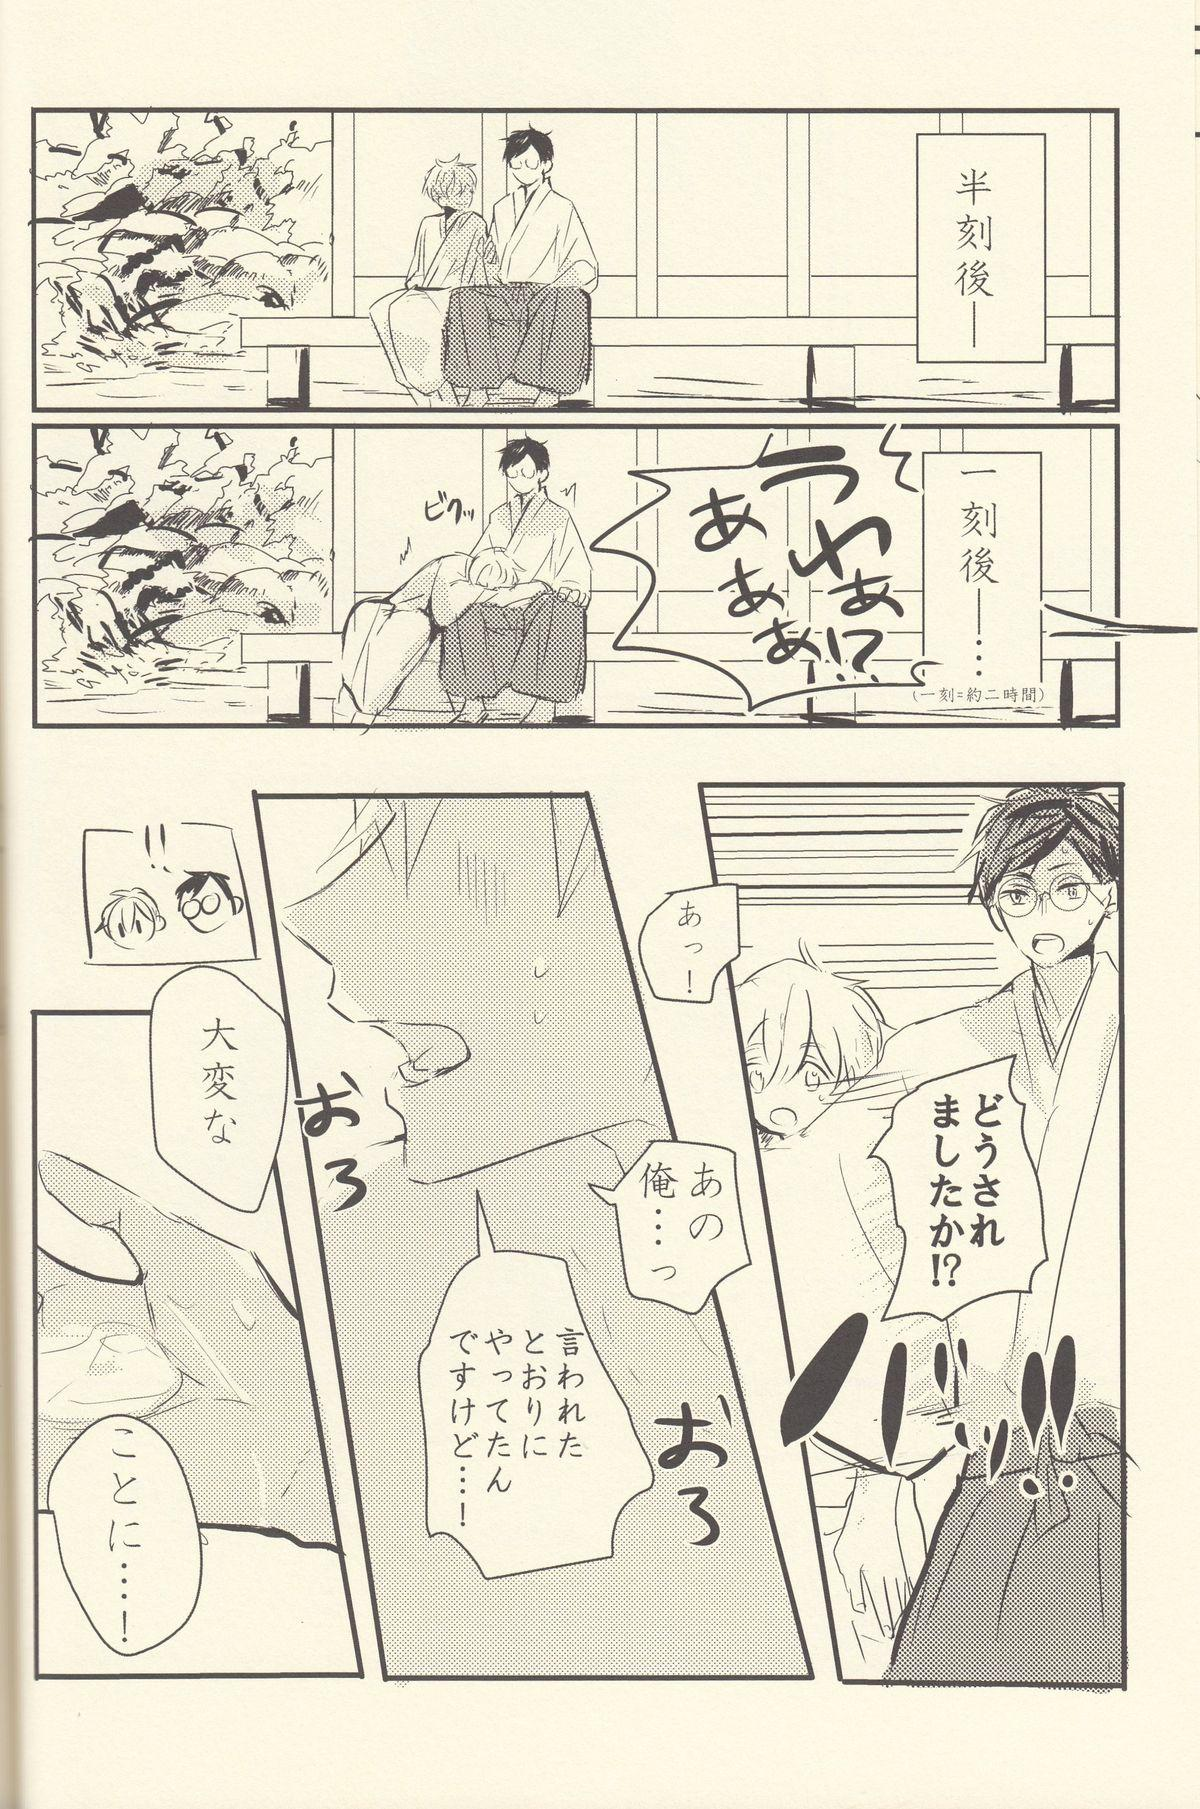 Shiofuki no Friendship - Makoto ♥ Haruka Squirting Anthology 21